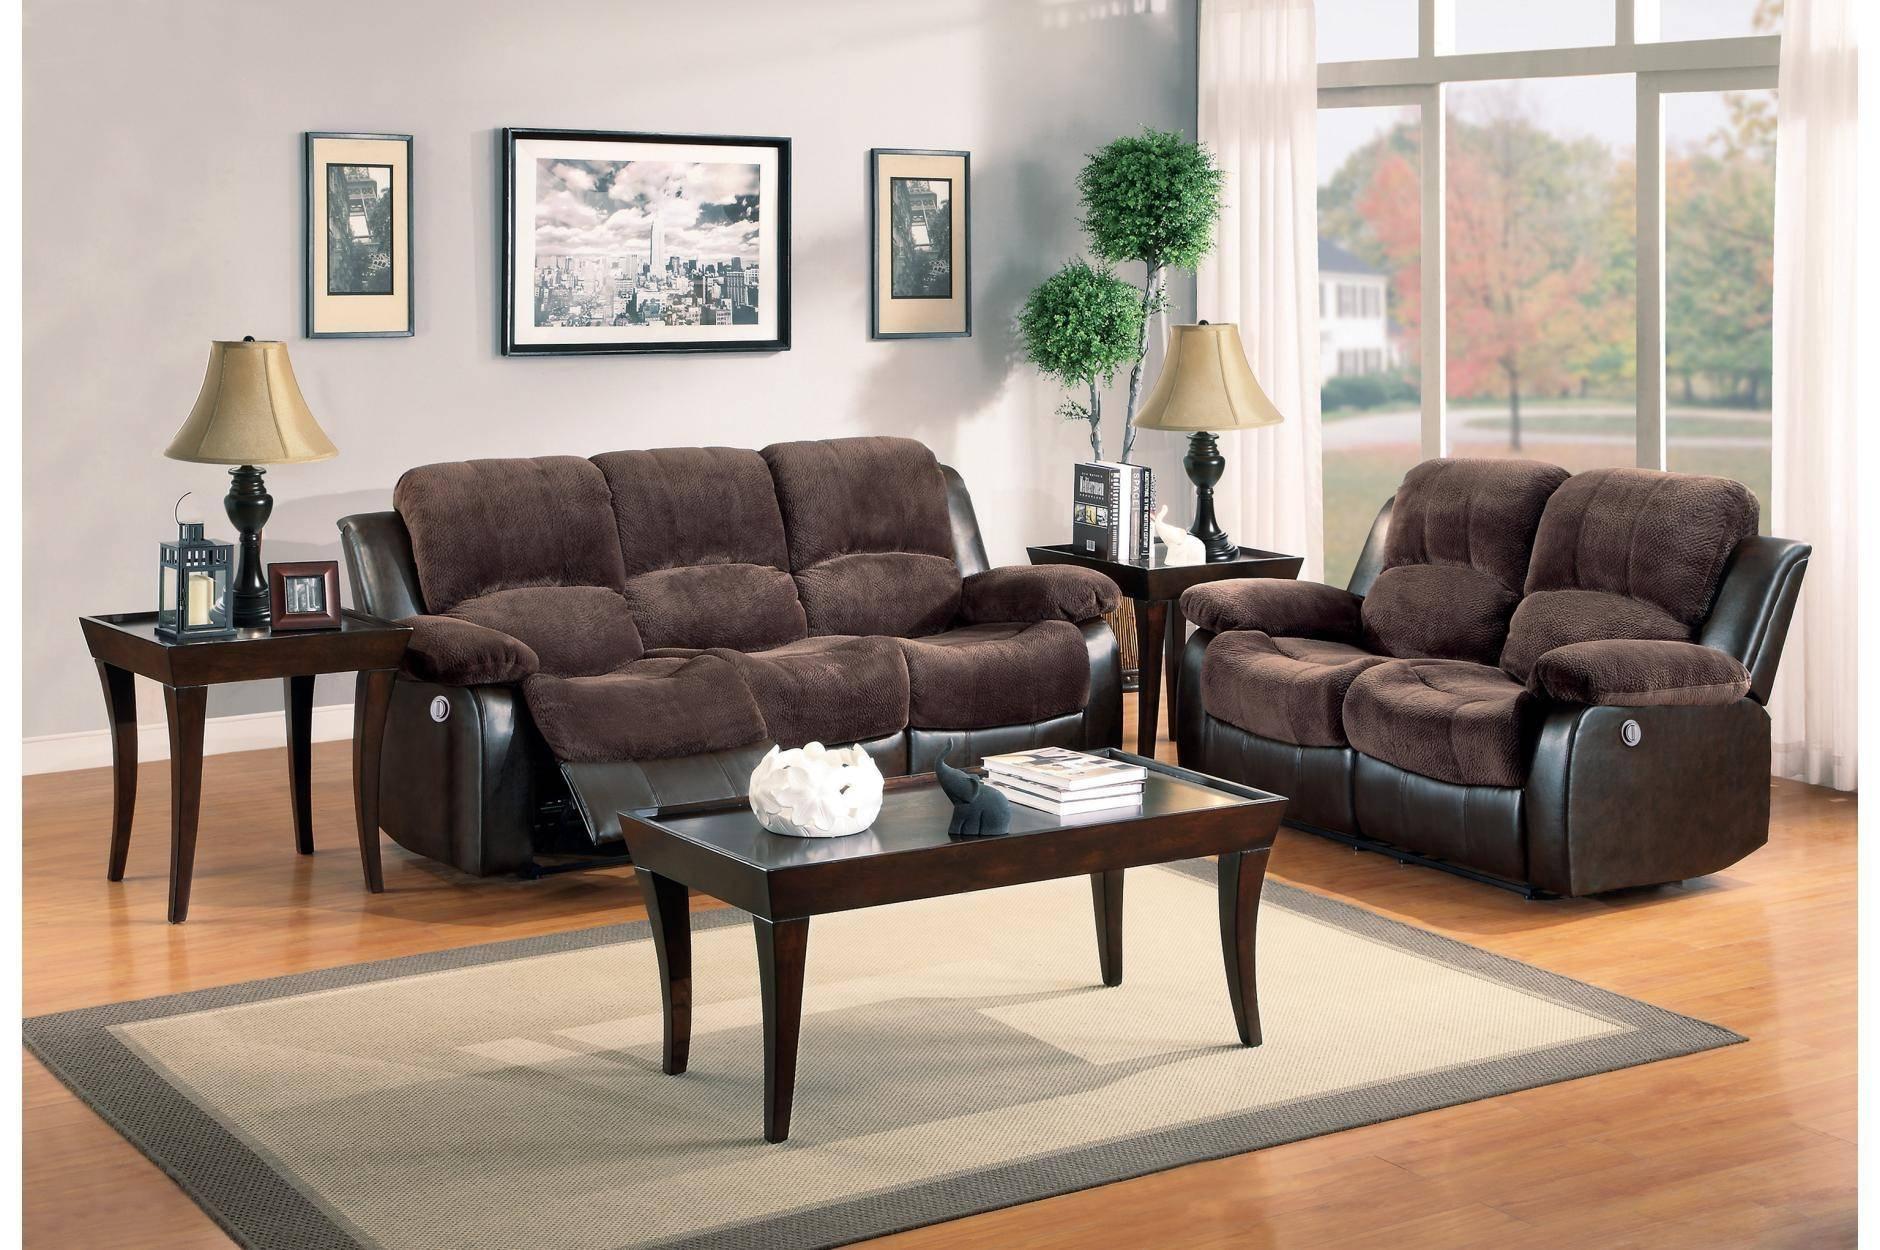 Astounding Homelegance Granley Recliner Sofa Set 2 Pcs In Chocolate Microfiber Gamerscity Chair Design For Home Gamerscityorg